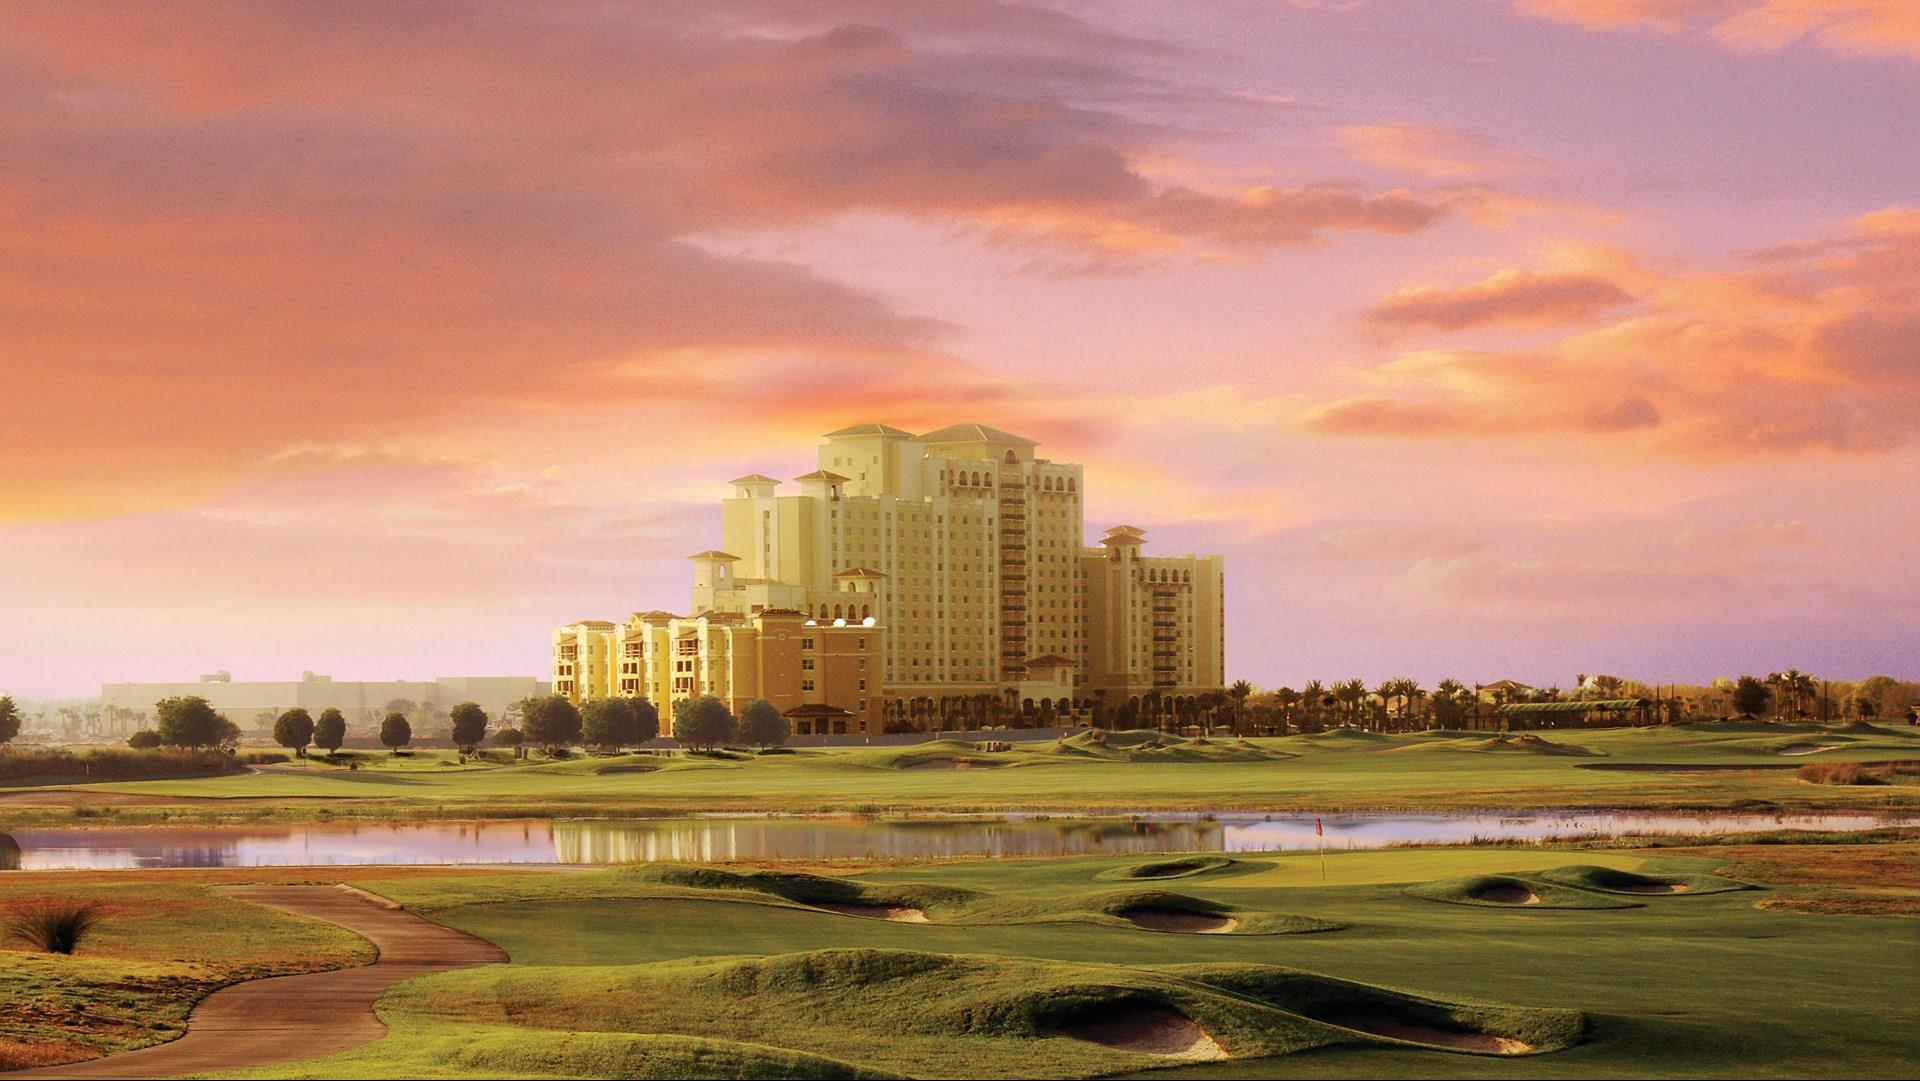 Meetings and events at Omni Orlando Resort at ChampionsGate